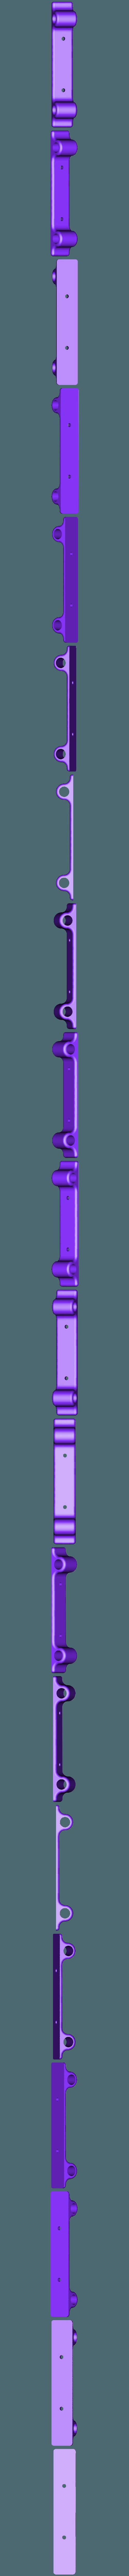 support.stl Download free STL file Wheelie tote box kit • Model to 3D print, Sagittario